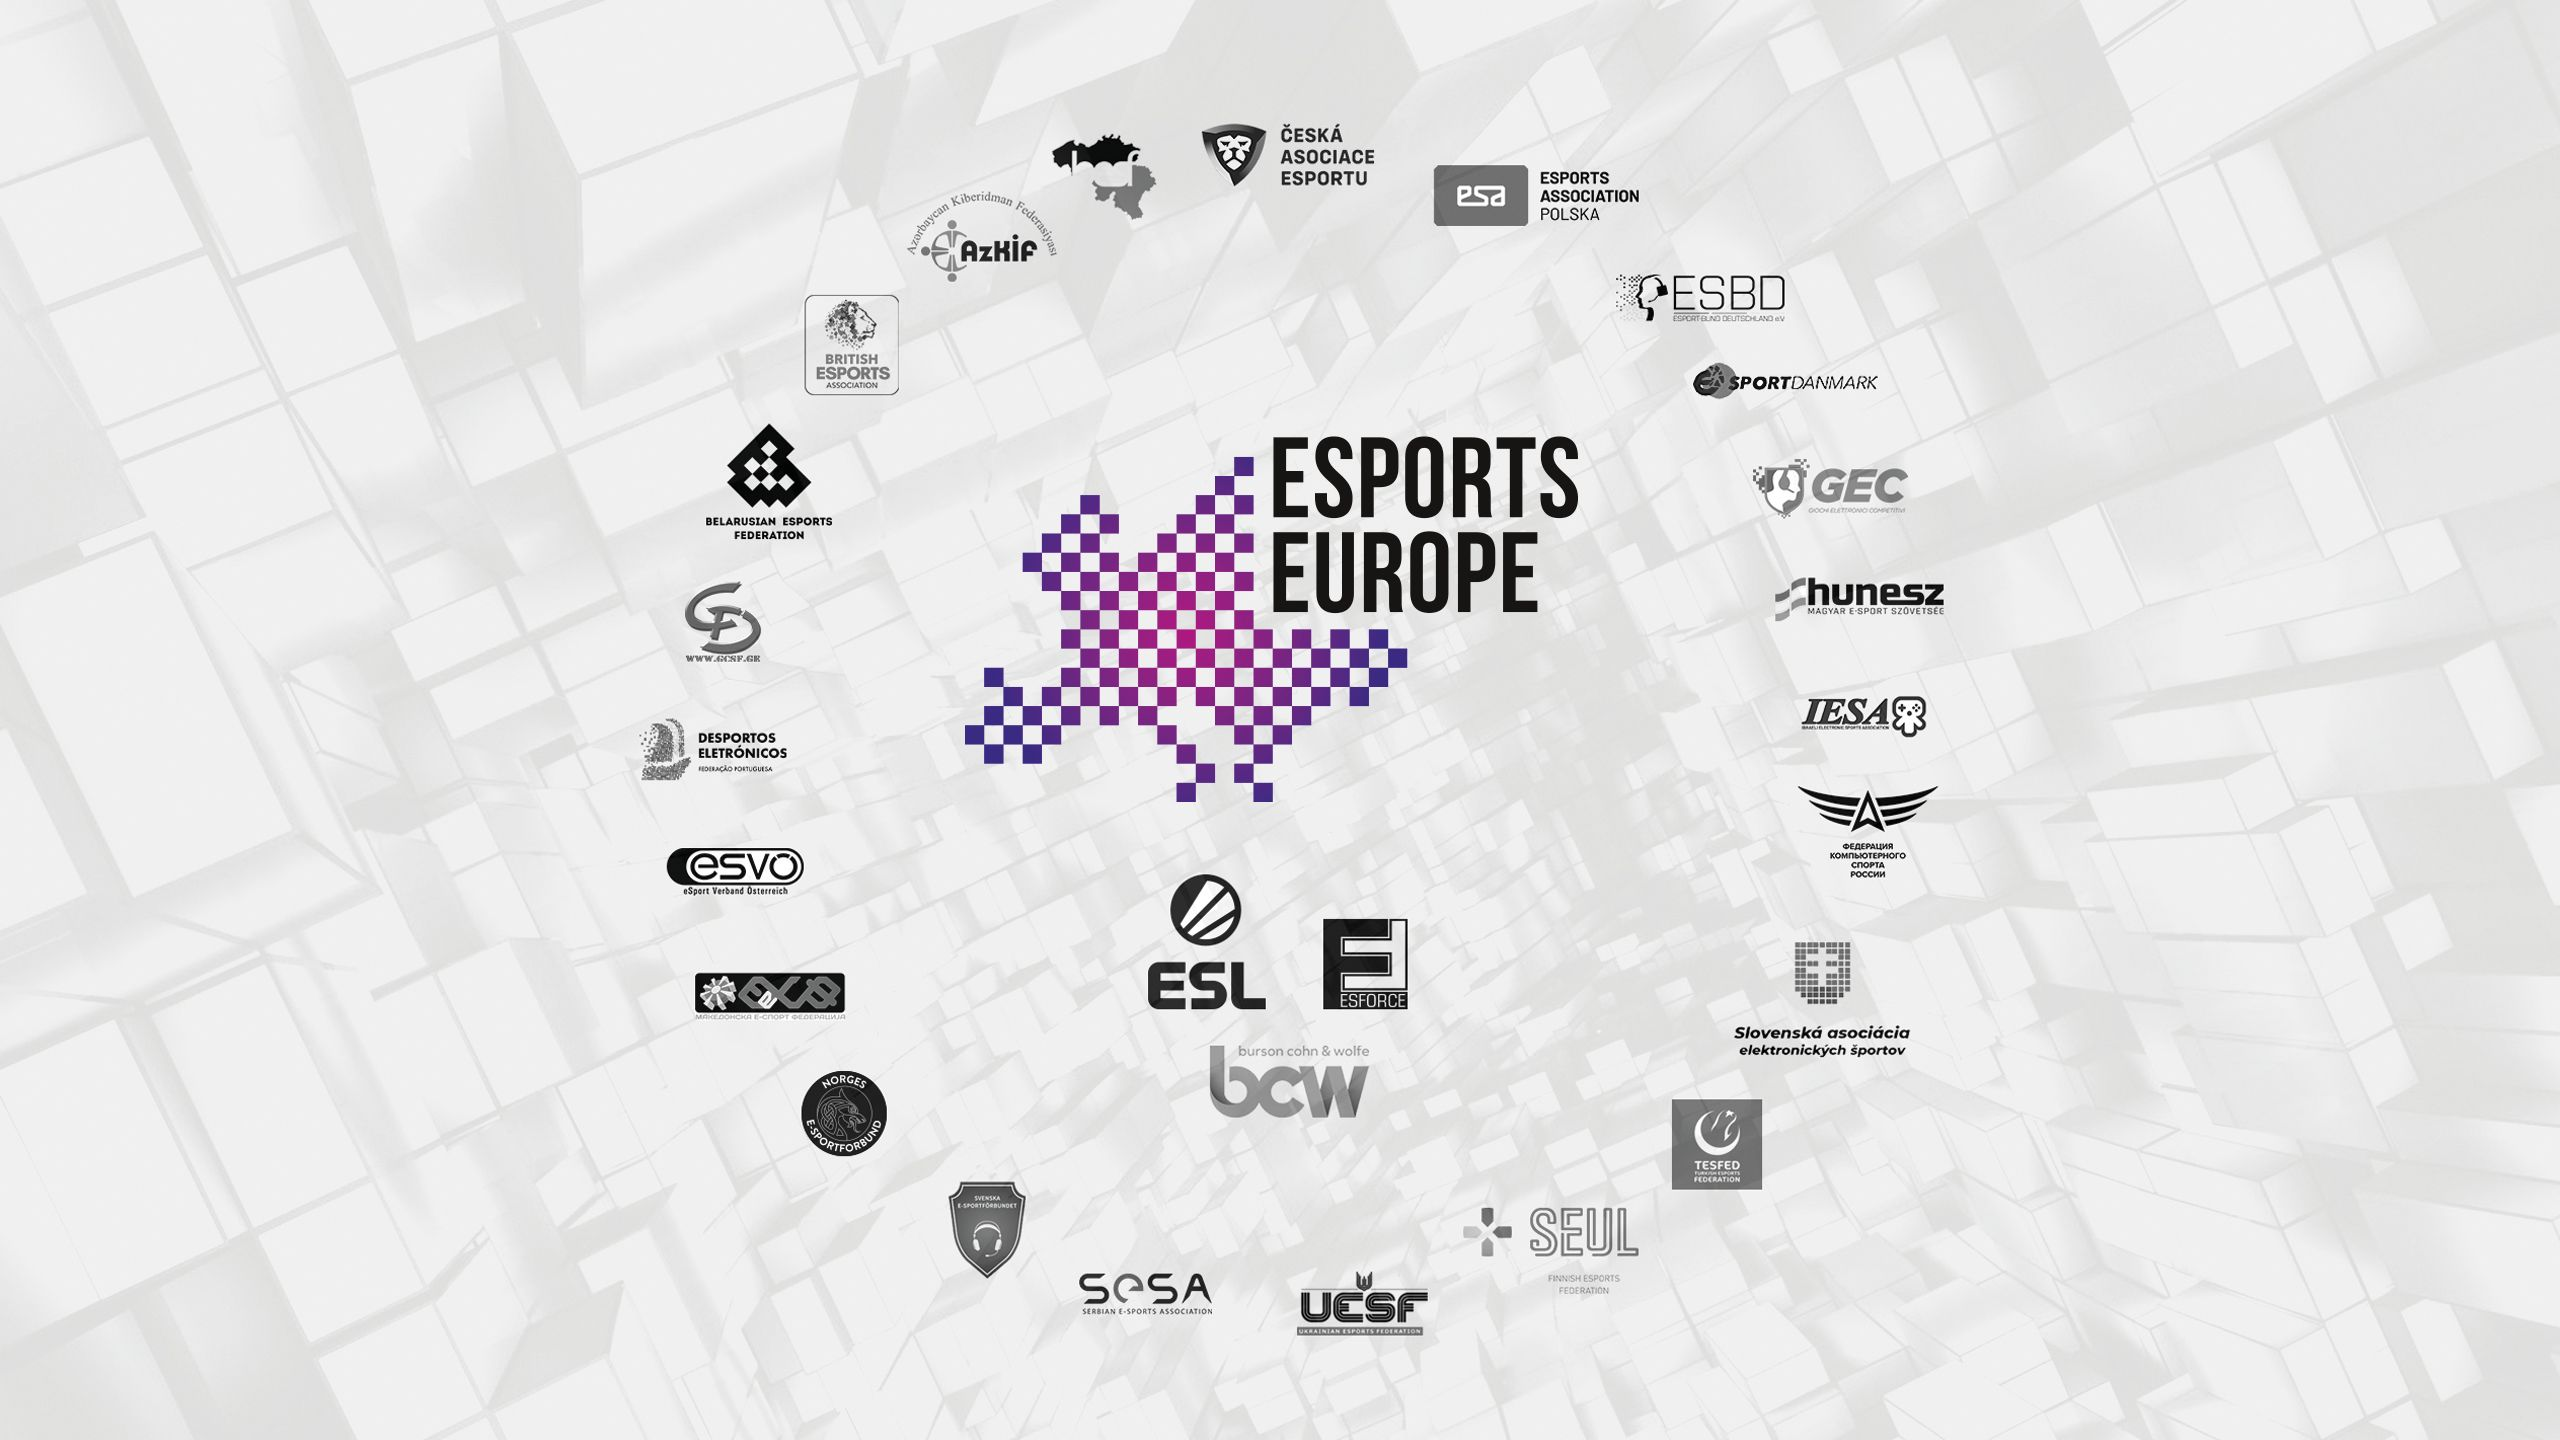 Evropska eSports federacija